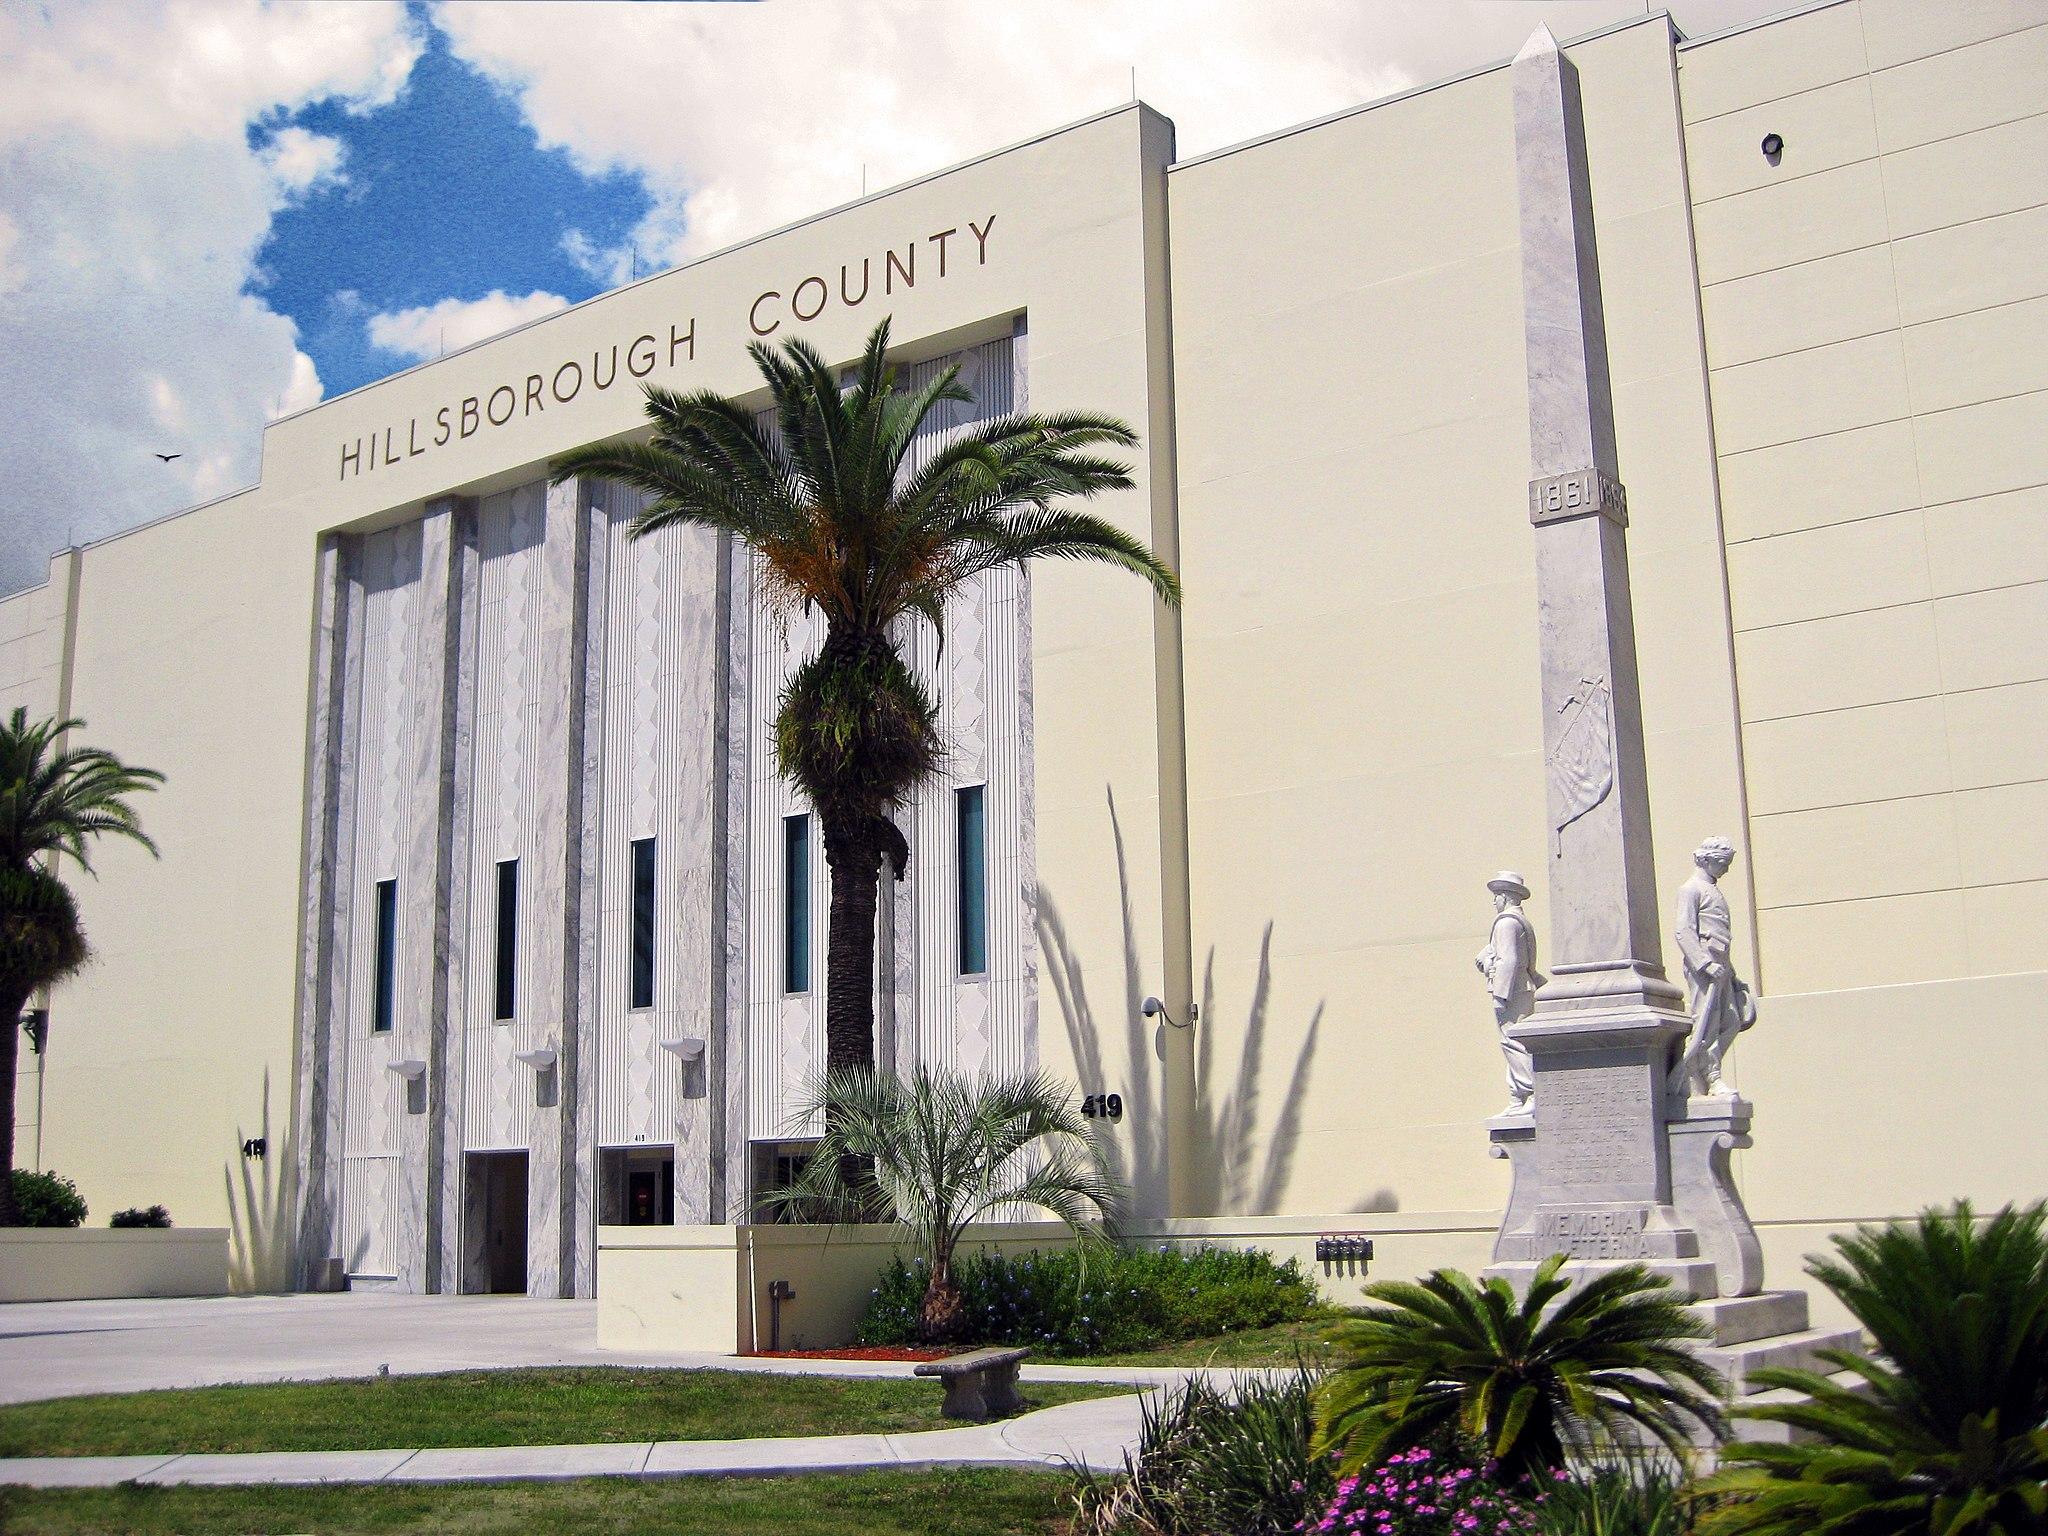 Courthouse & Confederate Memorial-Hillsborough County, Florida